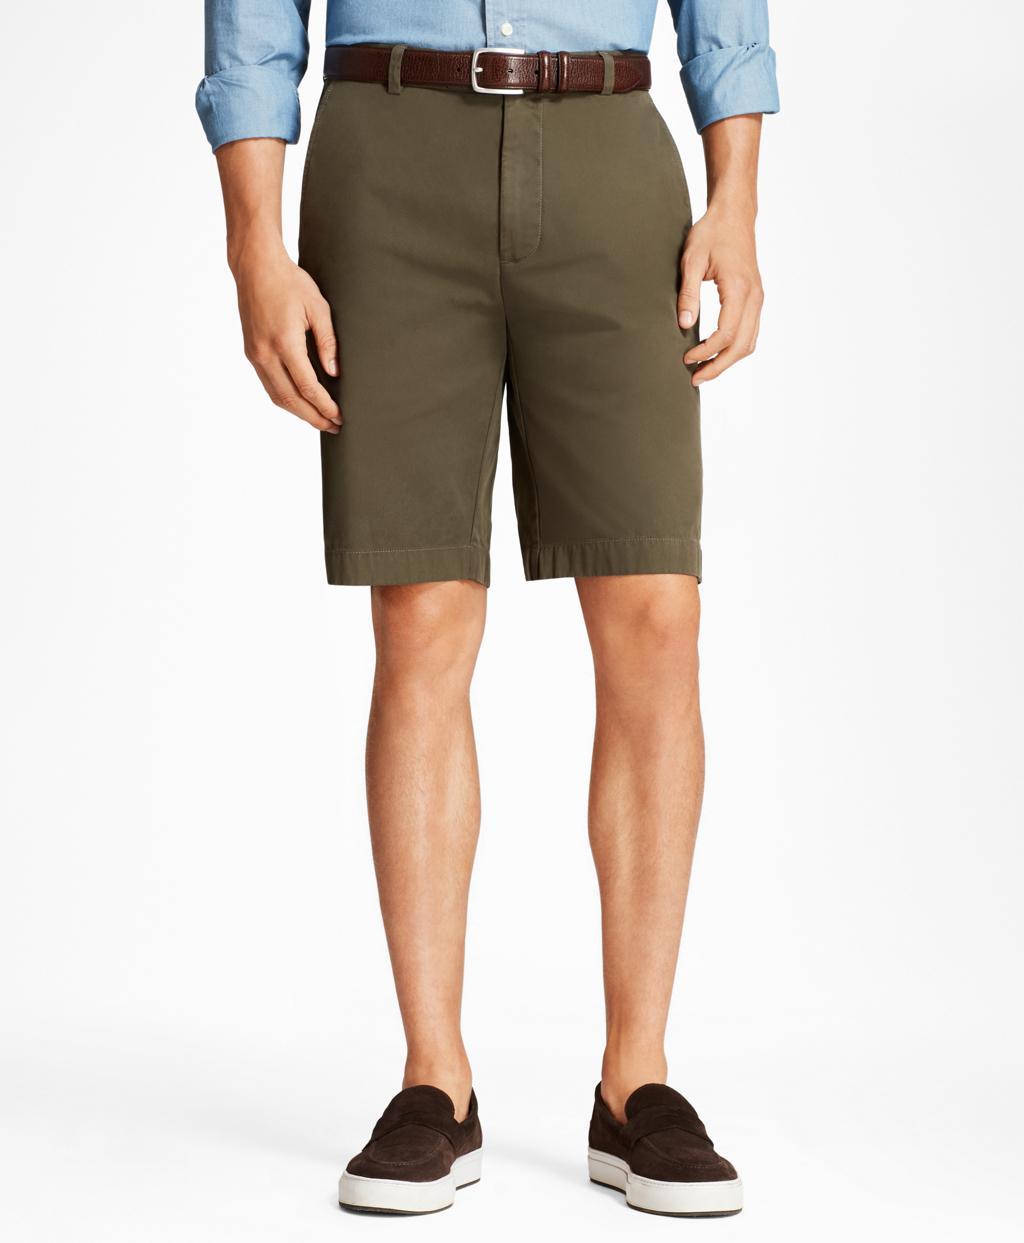 a3e7e33682 Brooks Brothers Garment-dyed 10